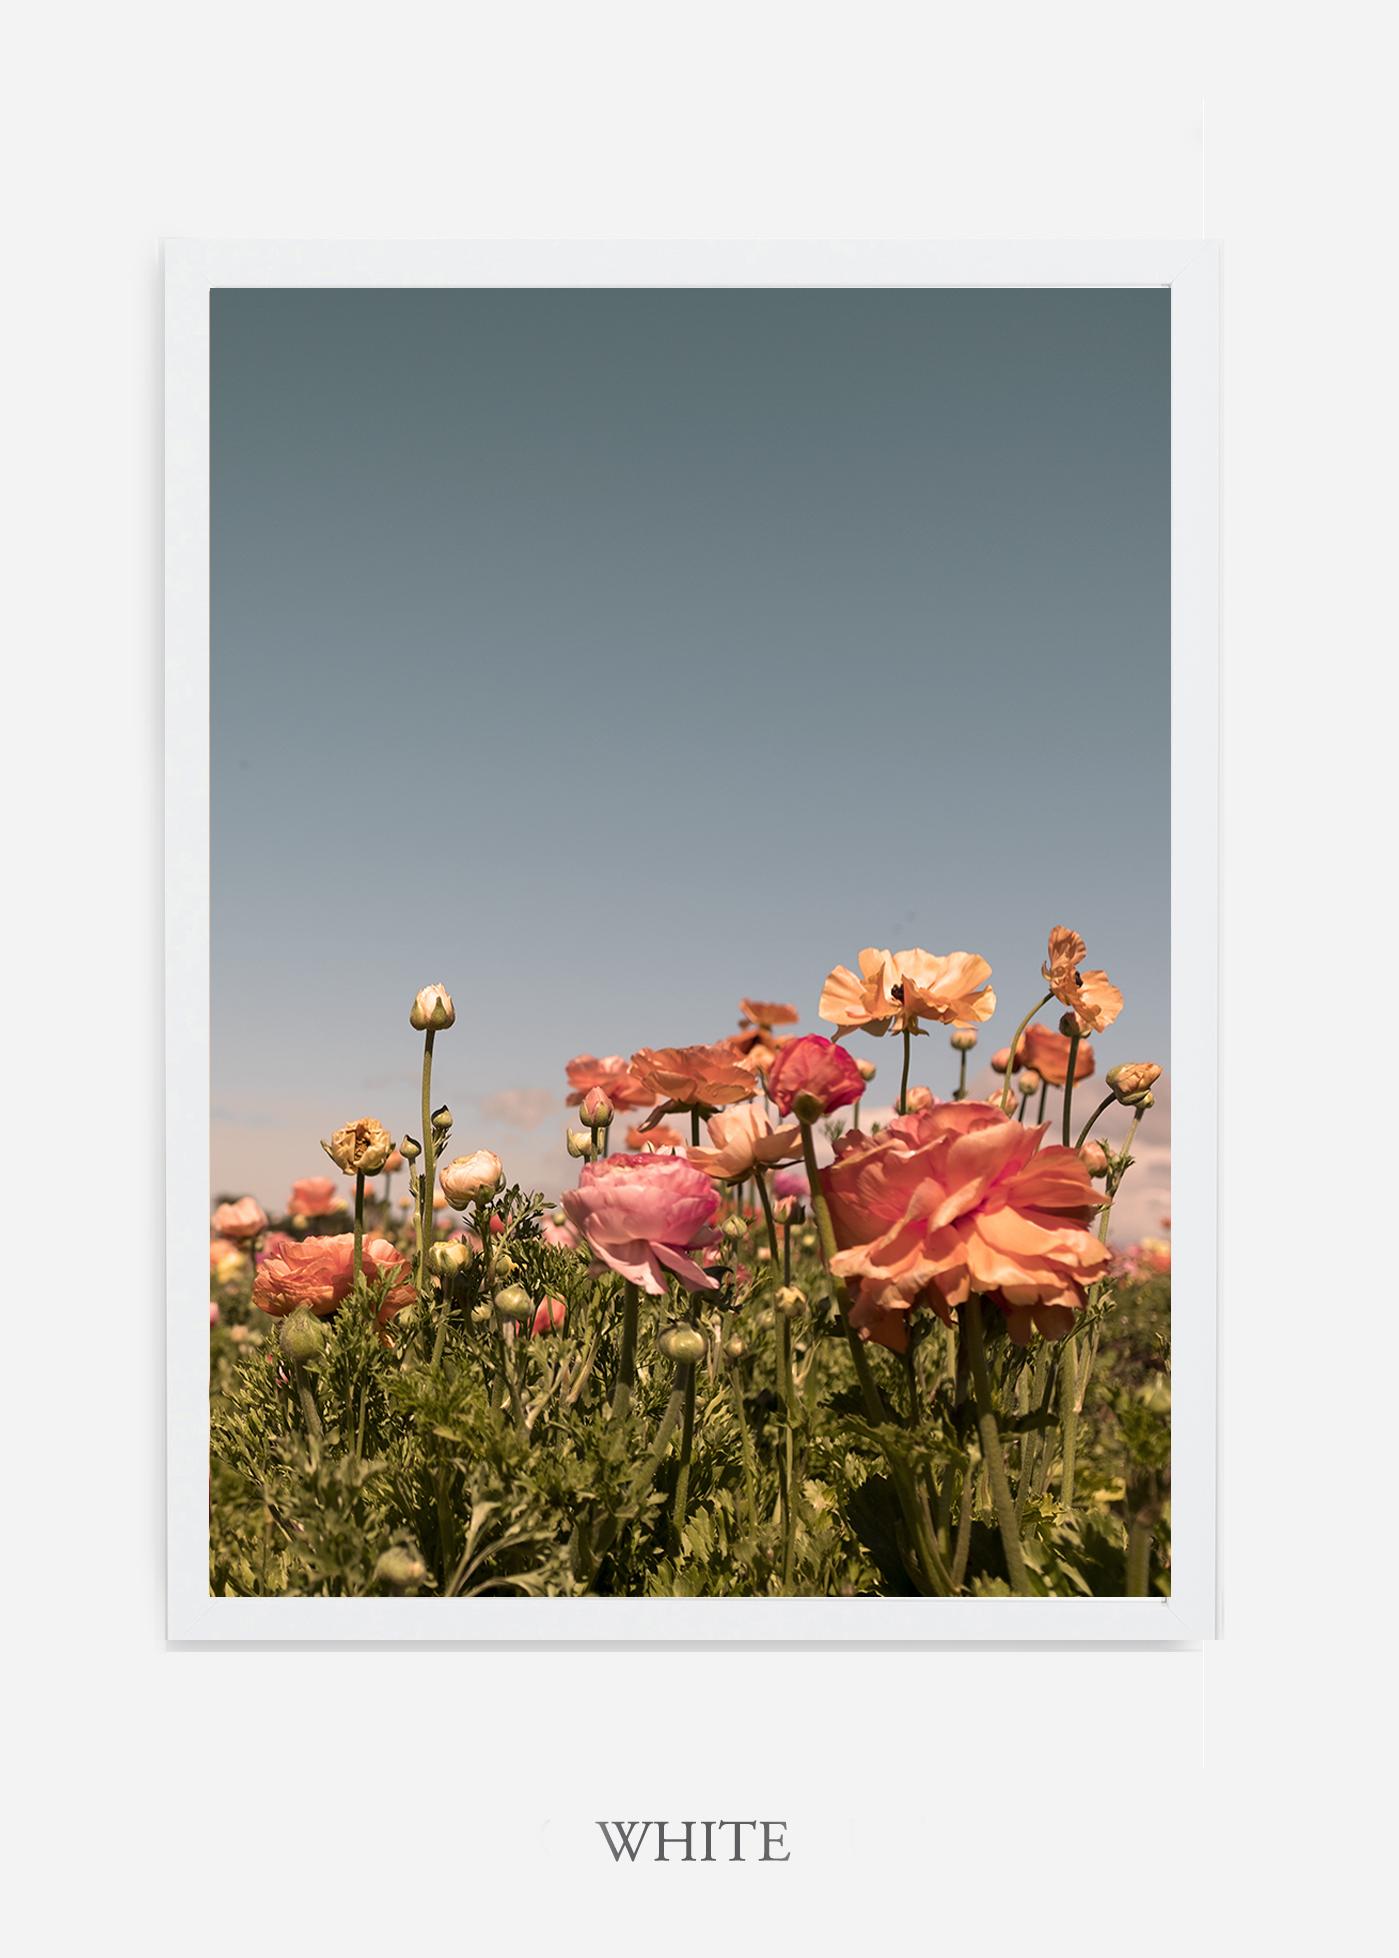 NoMat-White-Frame-Floral-No-1-Wilder-California-Art-Floral-Home-decor-Prints-Dahlia-Botanical-Artwork-Interior-design.jpg